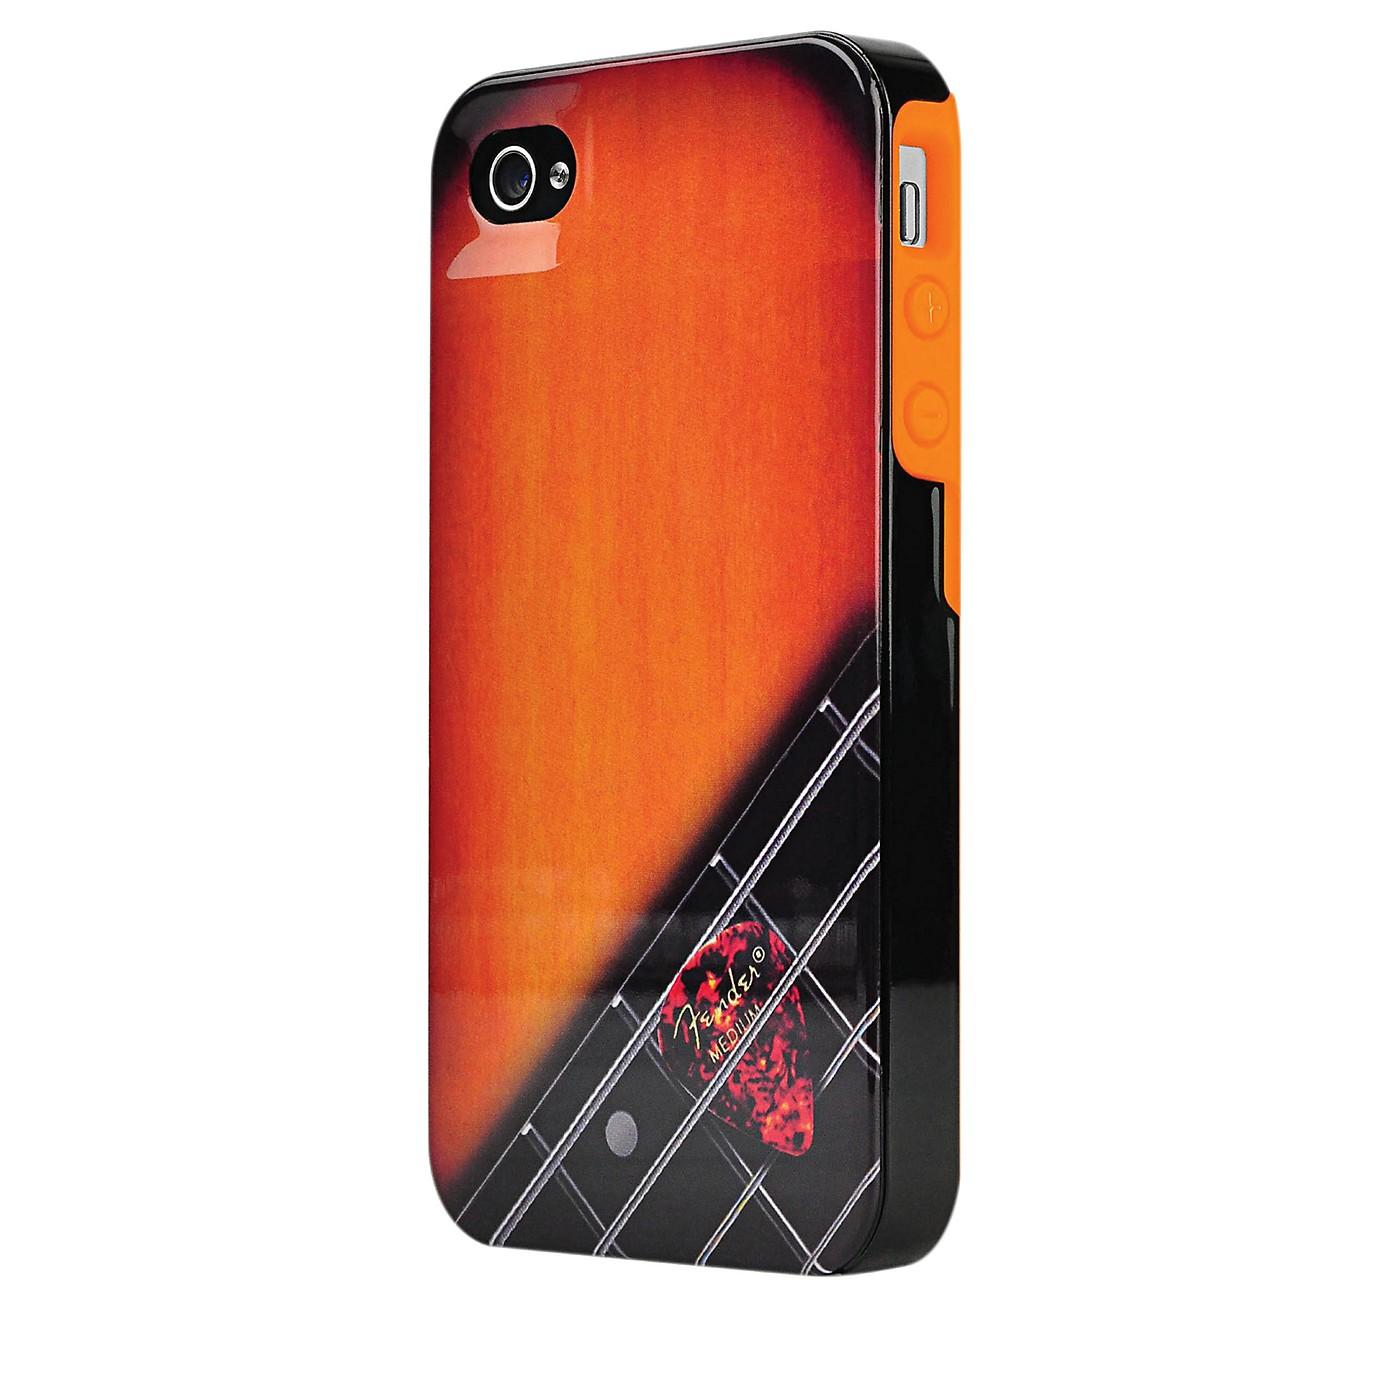 Hal Leonard Contour Design Fender iPhone 4/4S Wood Grain Hard Gloss Protective Case thumbnail